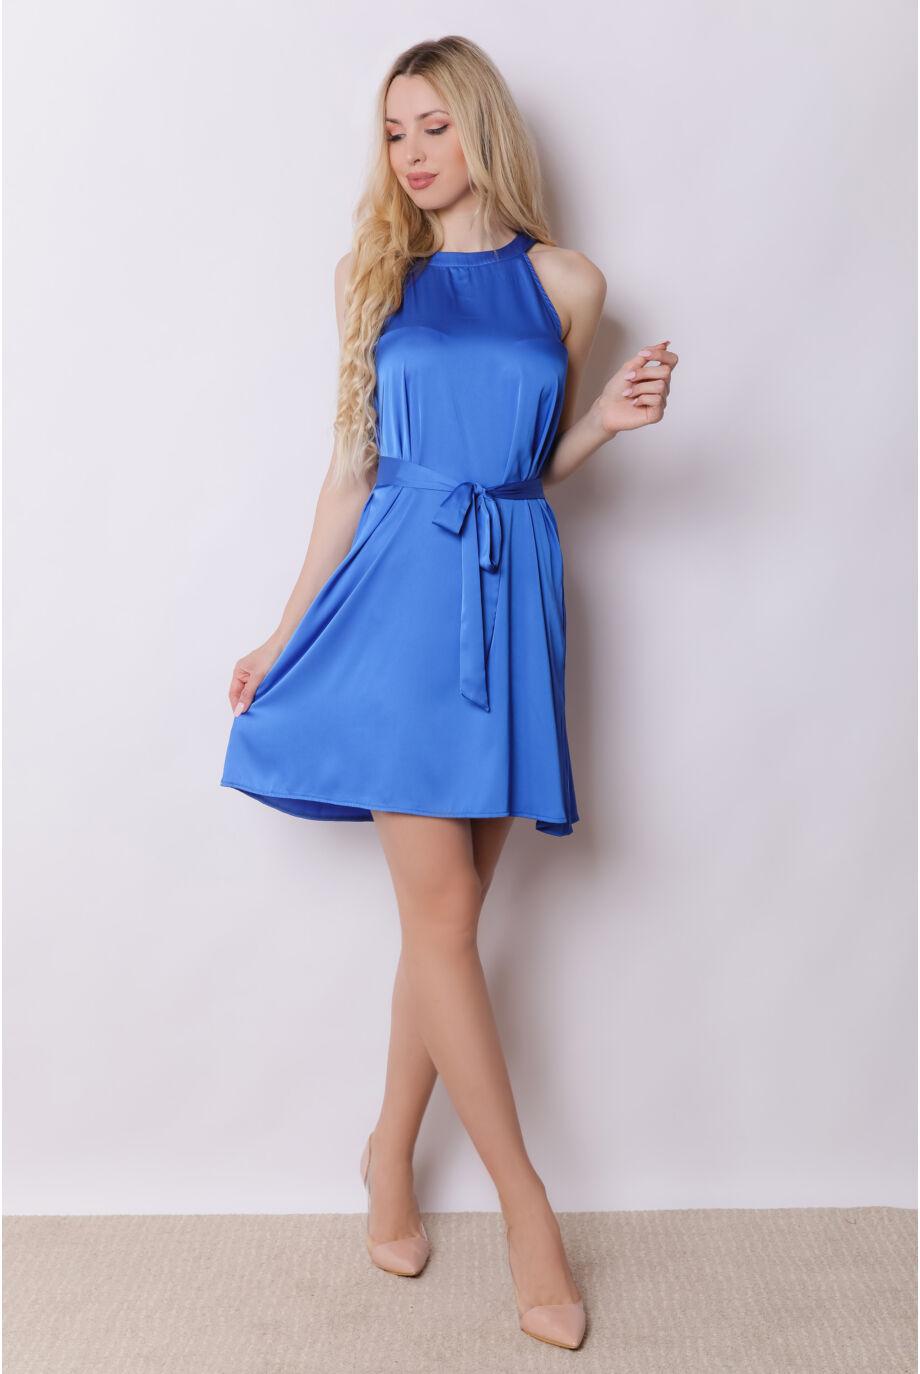 a_vonalu_bo_ruha_megkotovel_ena_kiralykek_blue_nature